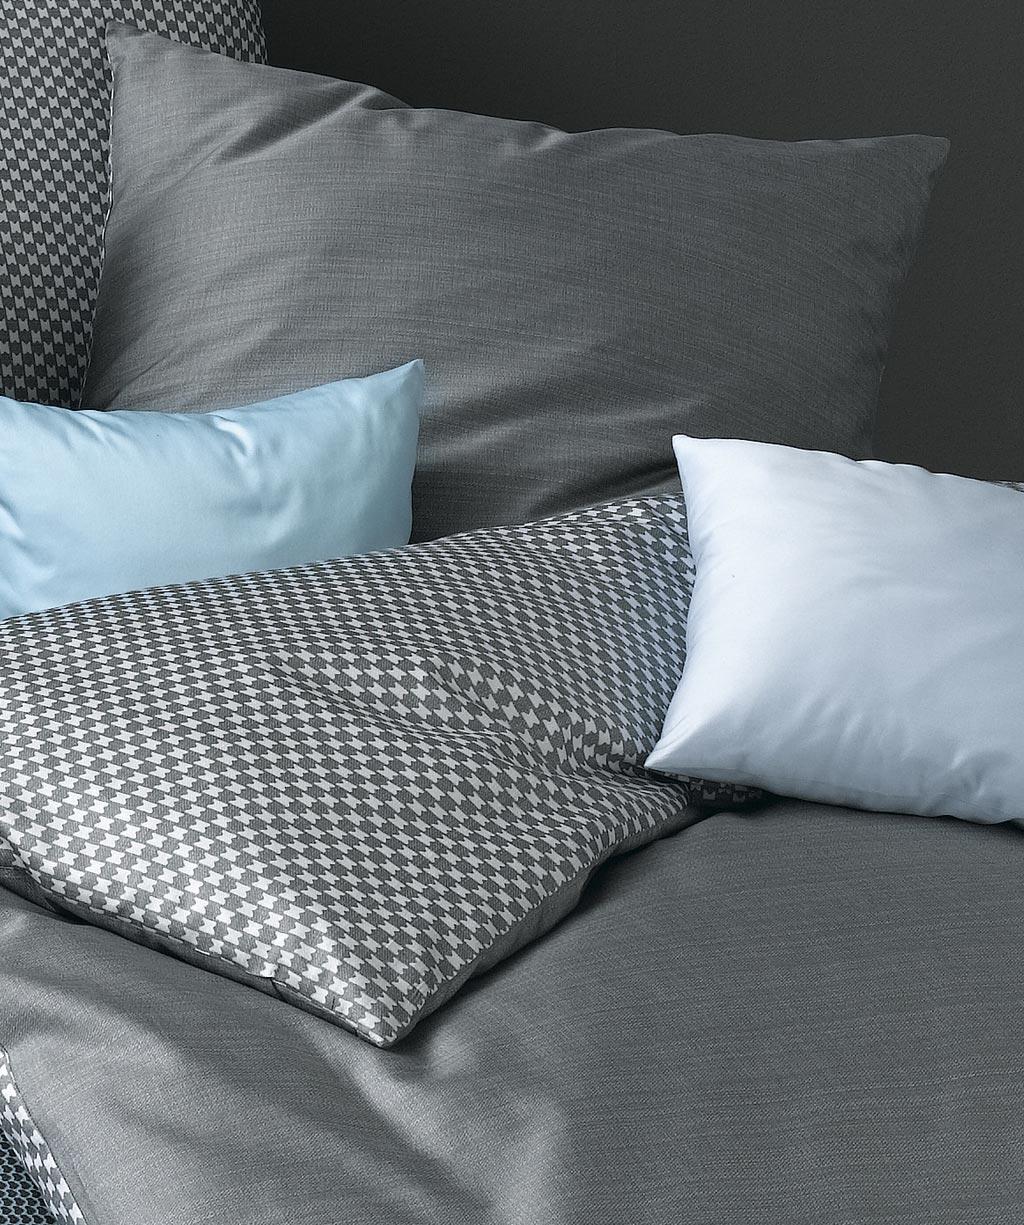 fleuresse bettw sche 240x220 reduziert sale ladyproject. Black Bedroom Furniture Sets. Home Design Ideas